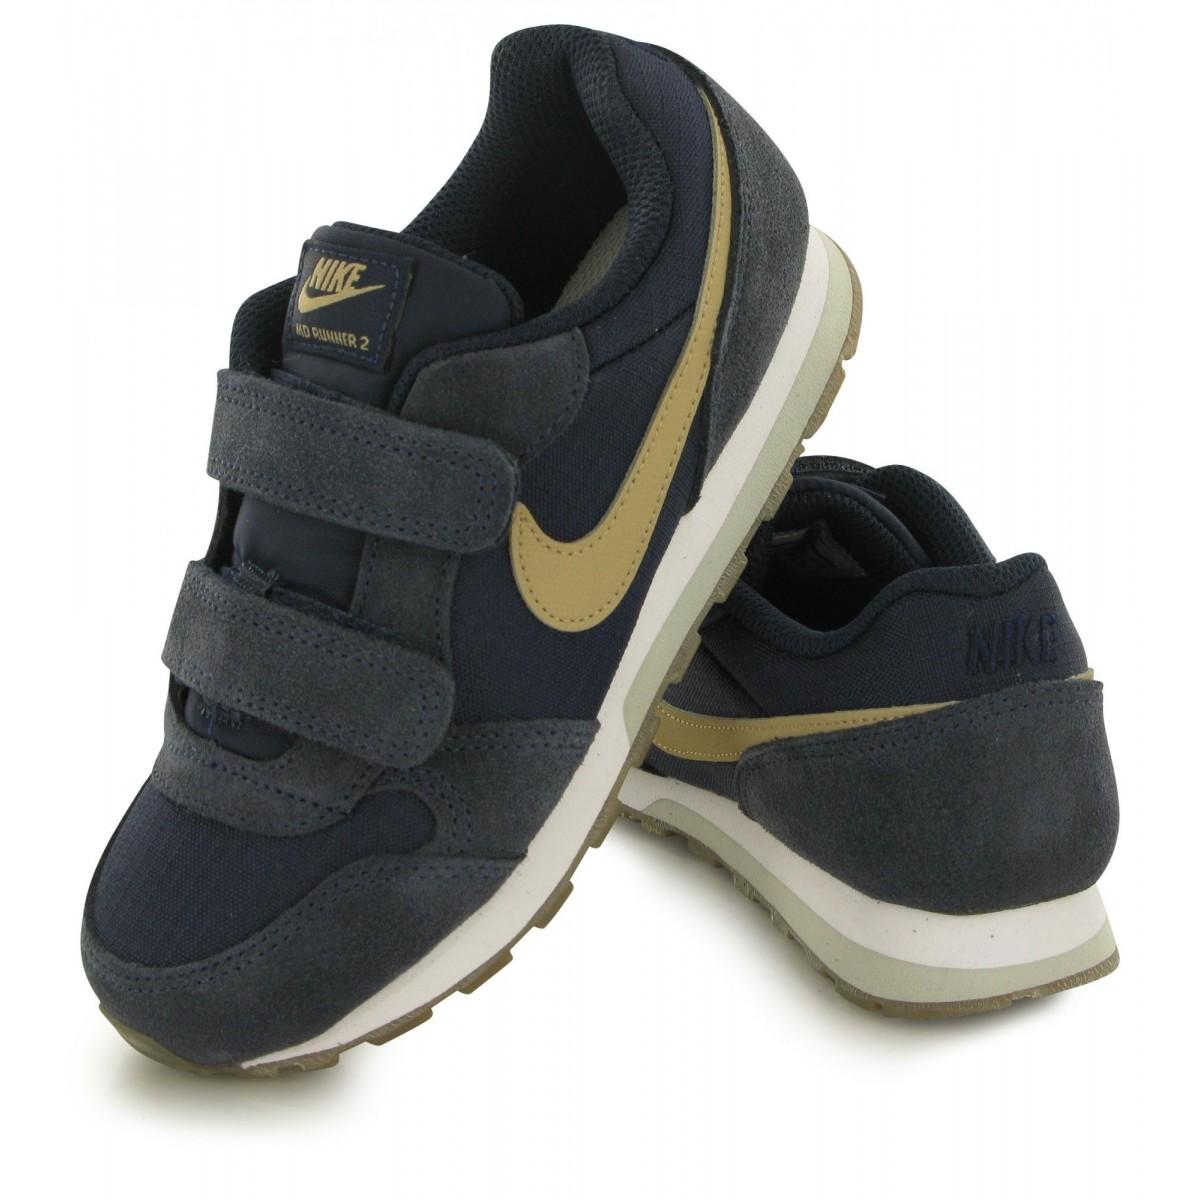 low priced 37473 ae120 ... Nike MD Runner 2 Zapatillas Niño 807317 409 Azul Marino ...